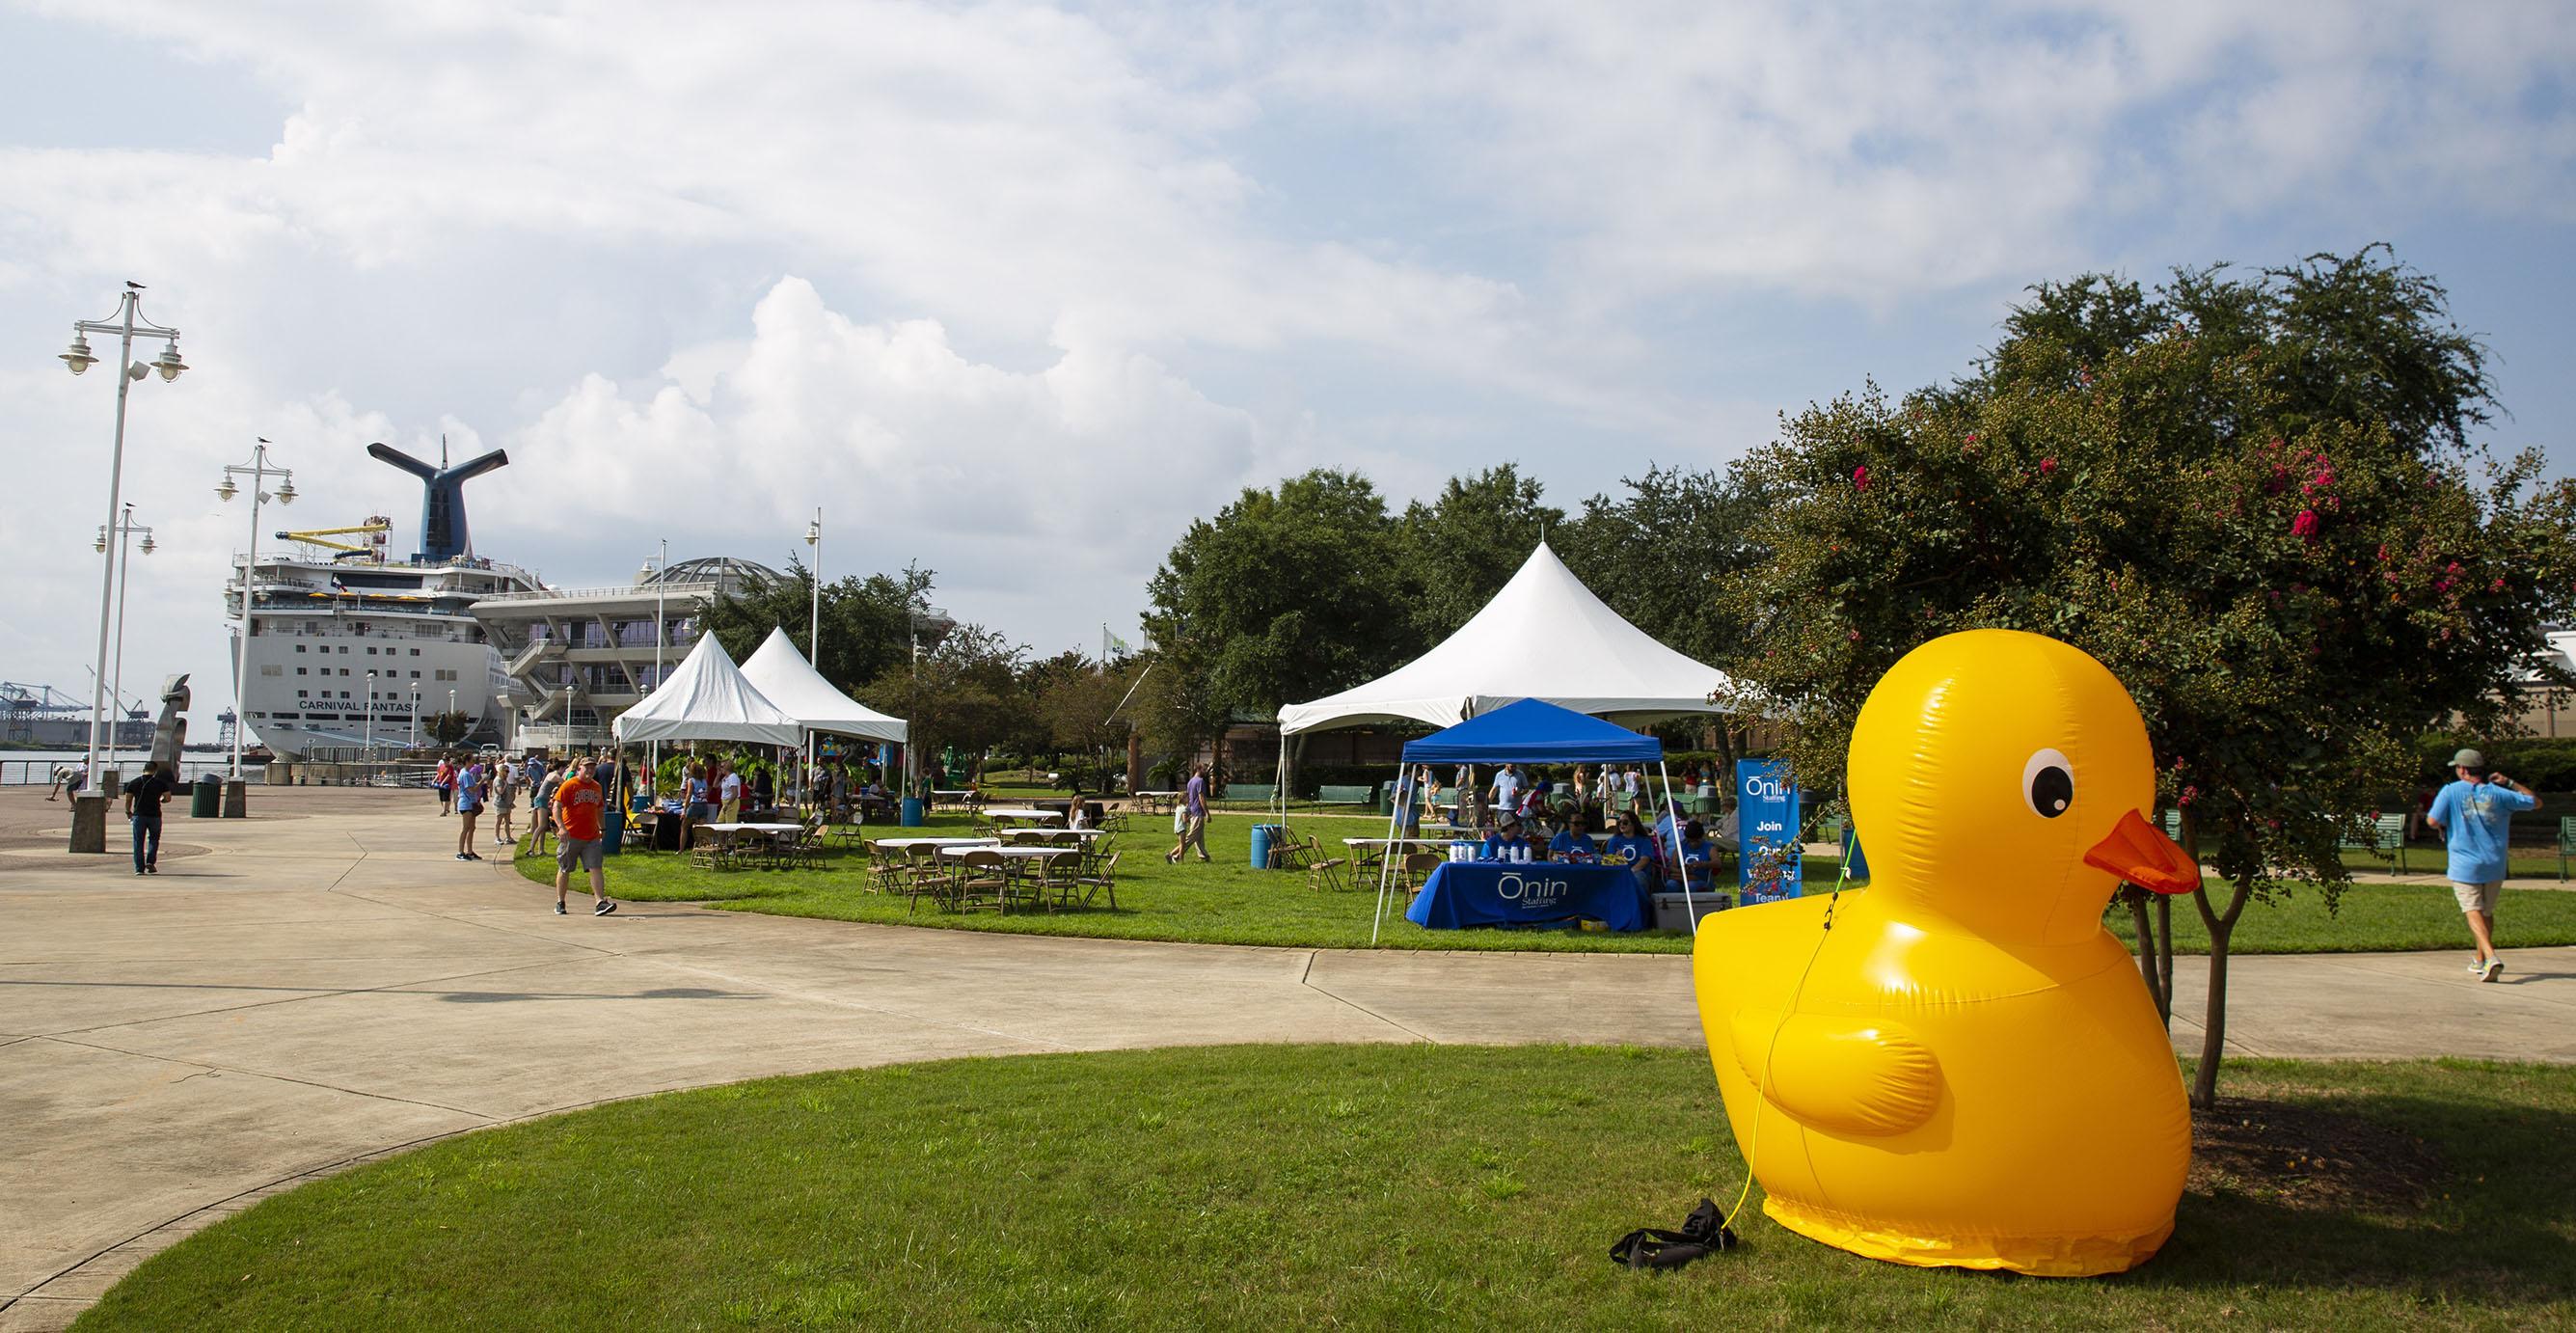 2018 rubber ducky regatta rubber ducky regatta